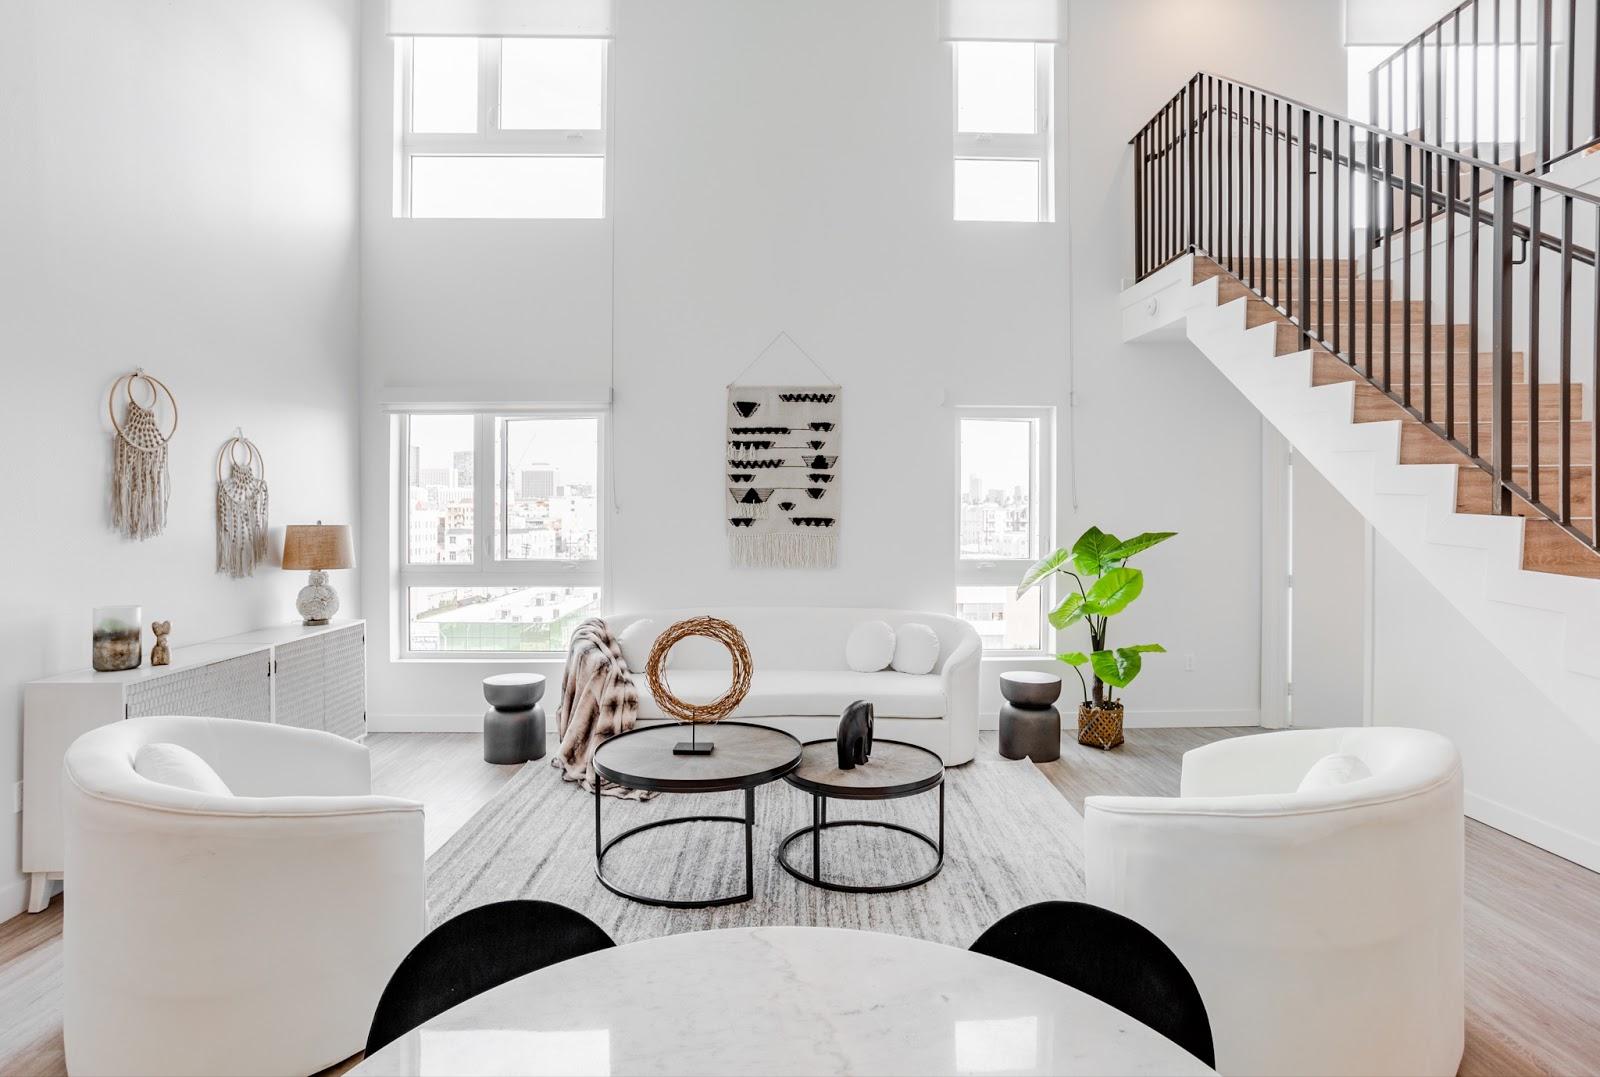 The Harper apartments